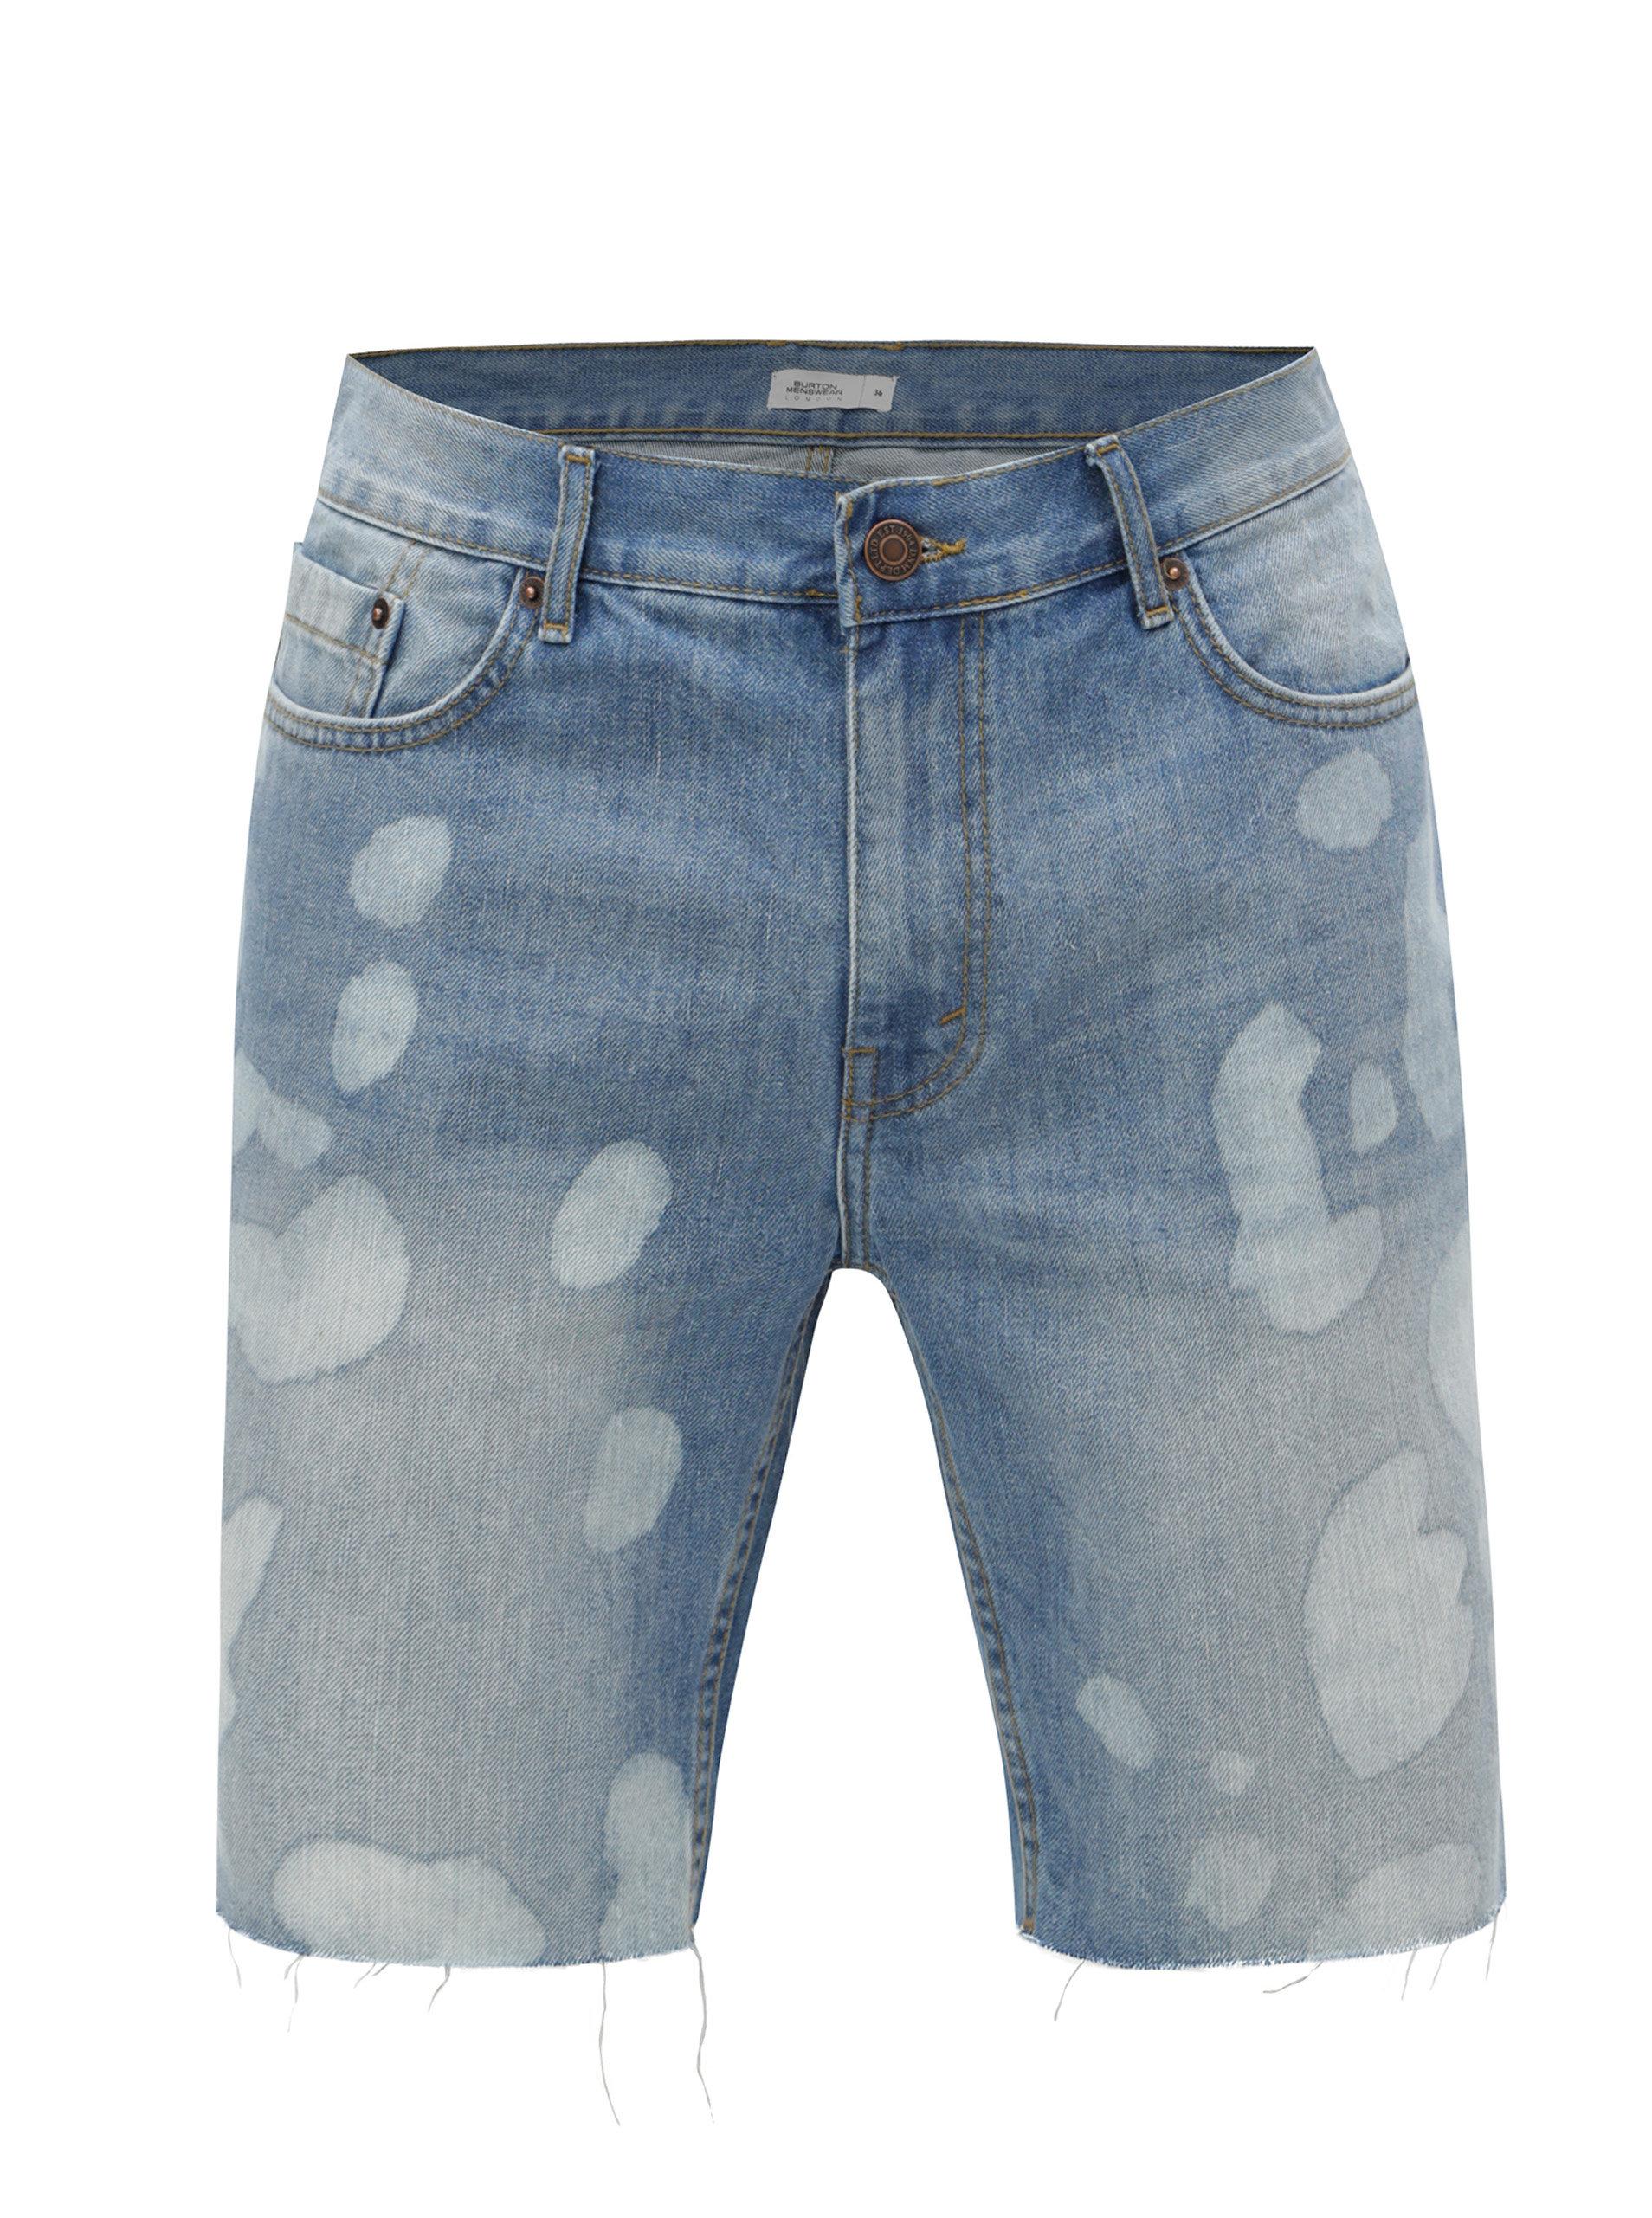 Modré džínové kraťasy s nezakončeným lemem Burton Menswear London ... 105ca907fd